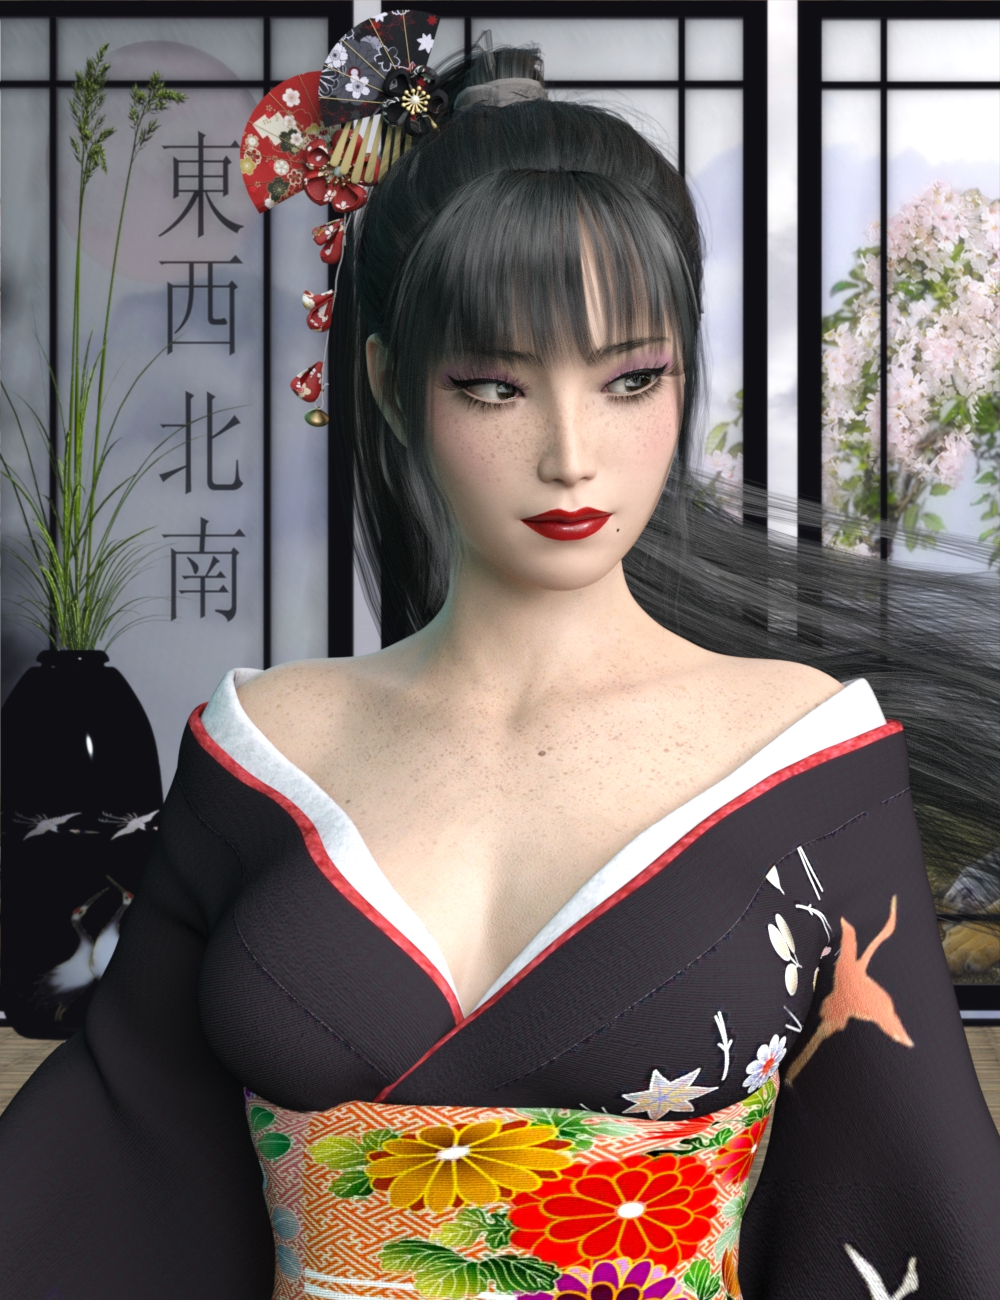 Kaoruko for Genesis 8 Female by: Tsukikawa, 3D Models by Daz 3D